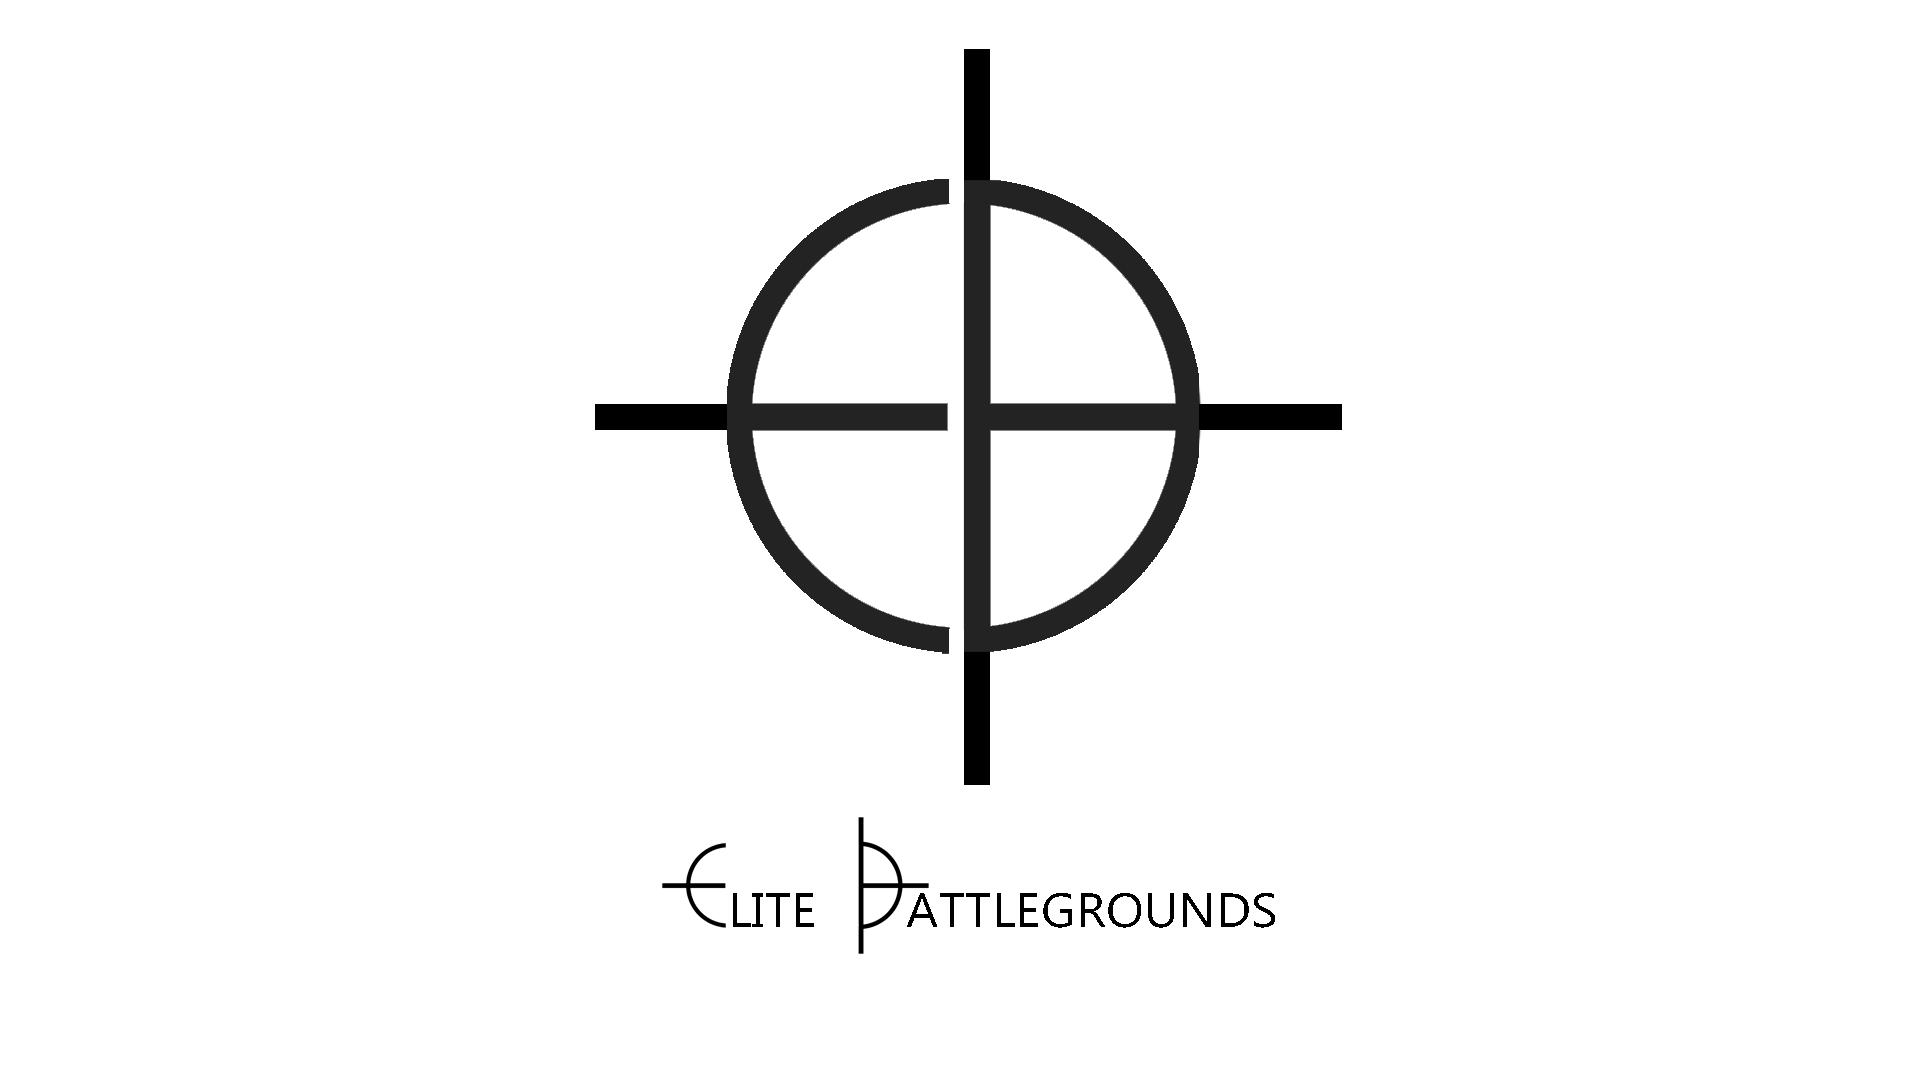 Logo Design by Sam Hedrén - Entry No. 65 in the Logo Design Contest Creative Logo Design for Elite Battlegrounds.